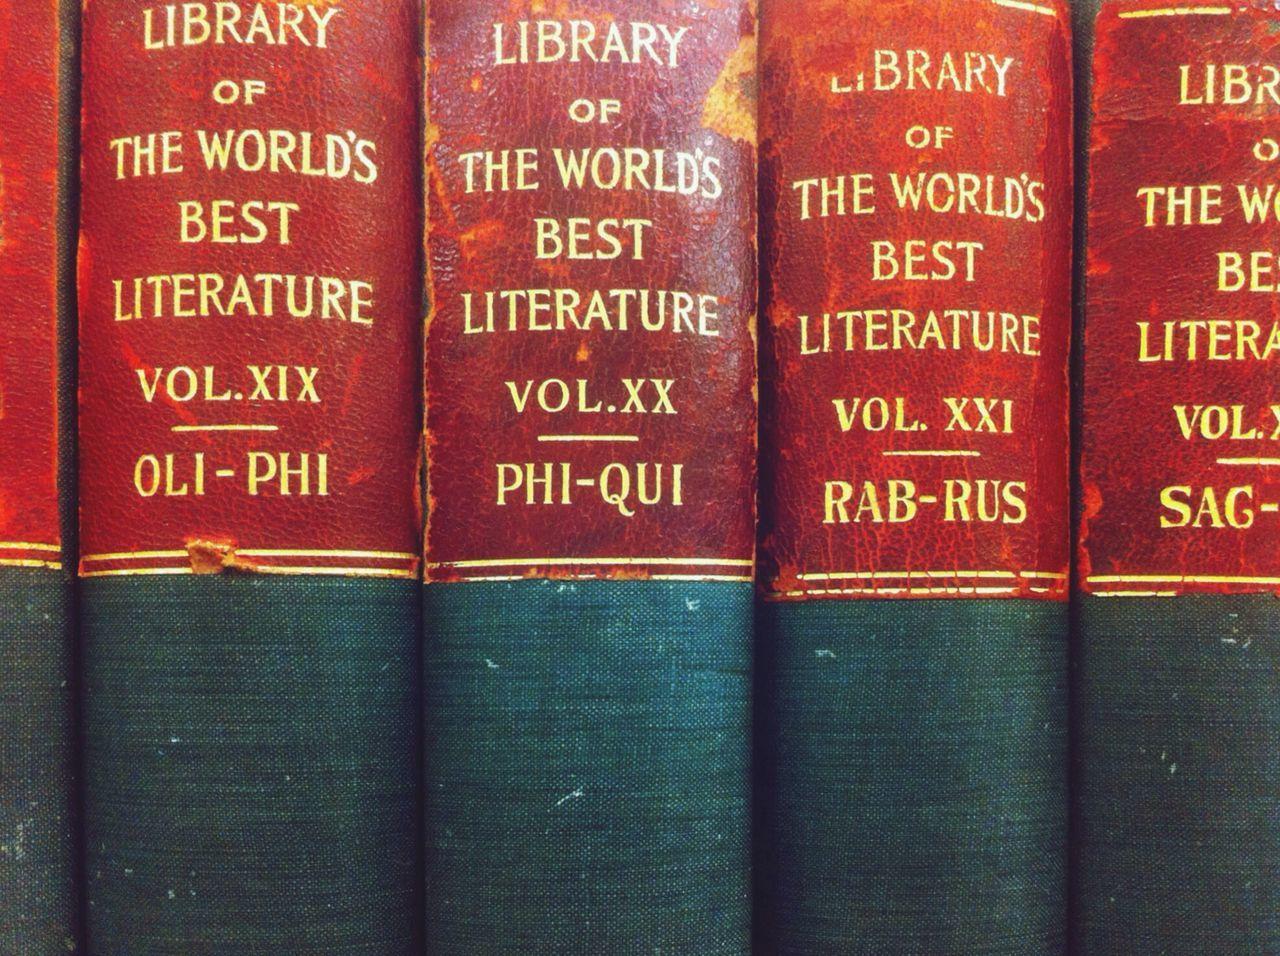 Book Books Literature Literatura Library History Dictionary BOOK SHELF Book Store Read